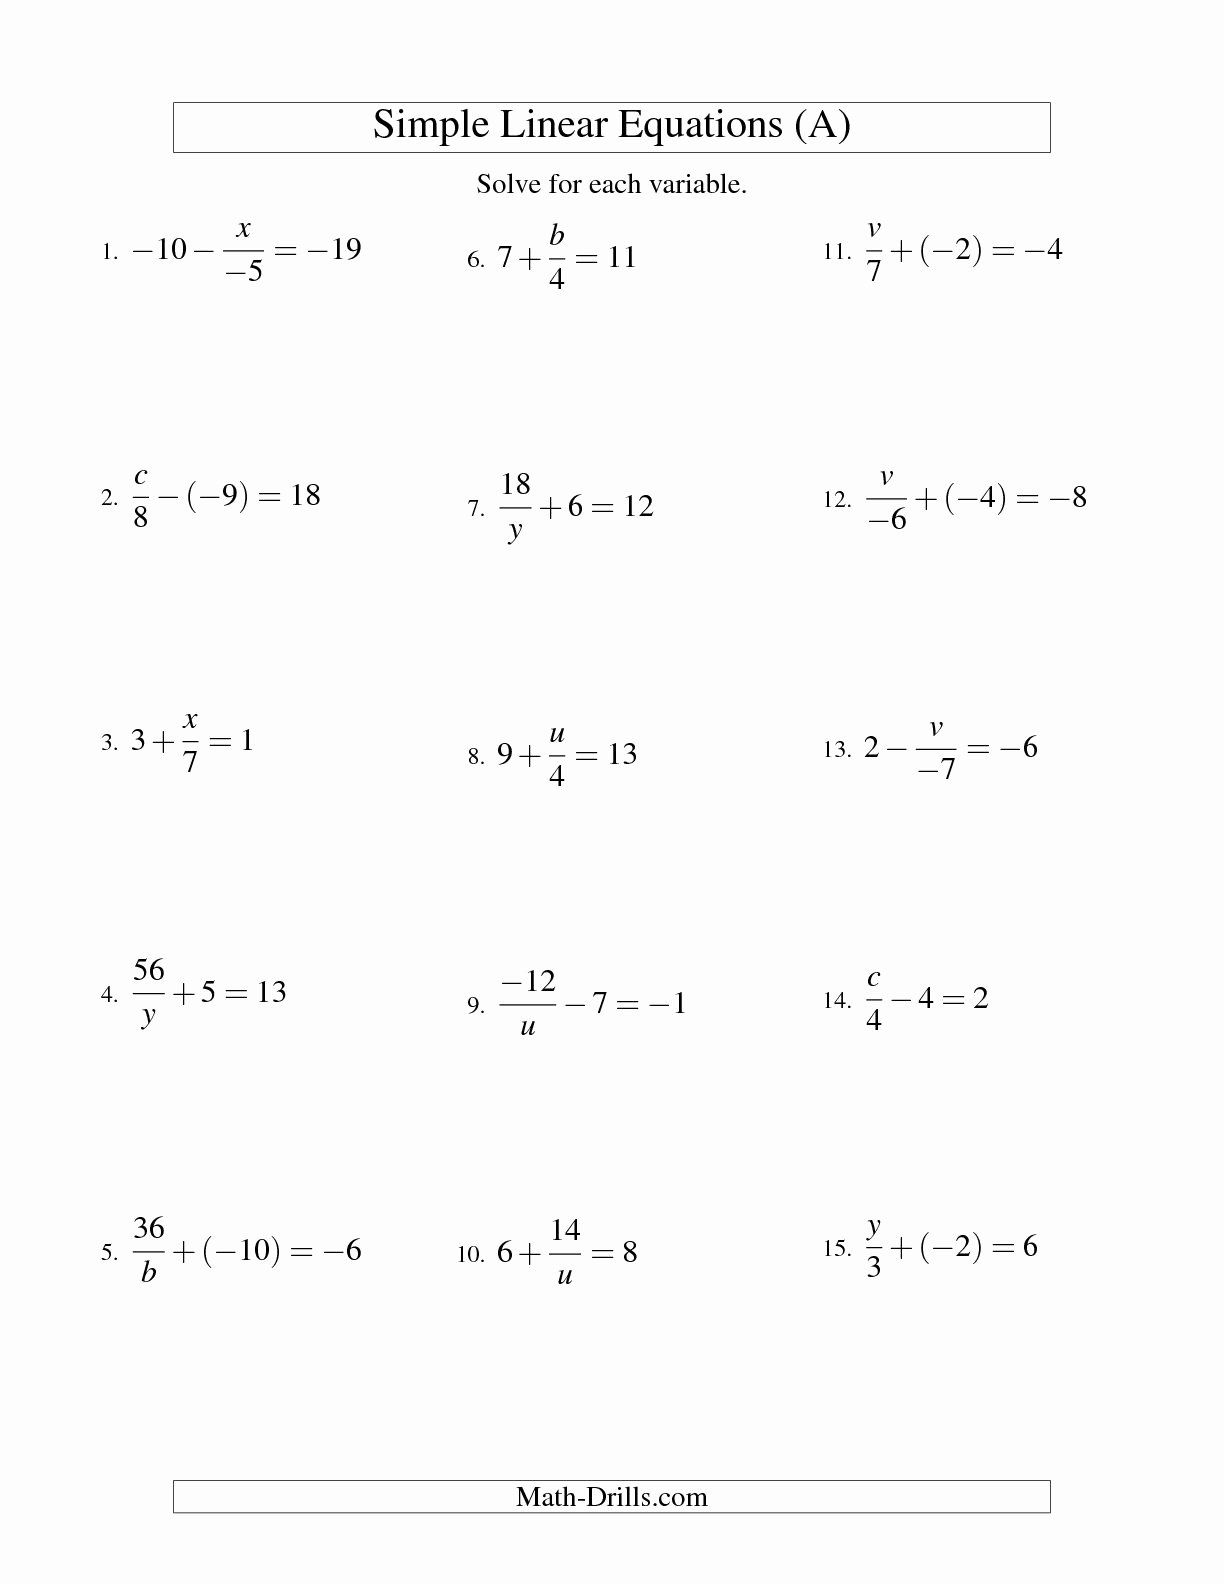 Factoring With Symbols Using Symbols Instead Of Numbers To Help Students See The Factoring Patterns Mrsetea Algebra Factoring Quadratics Algebra Worksheets